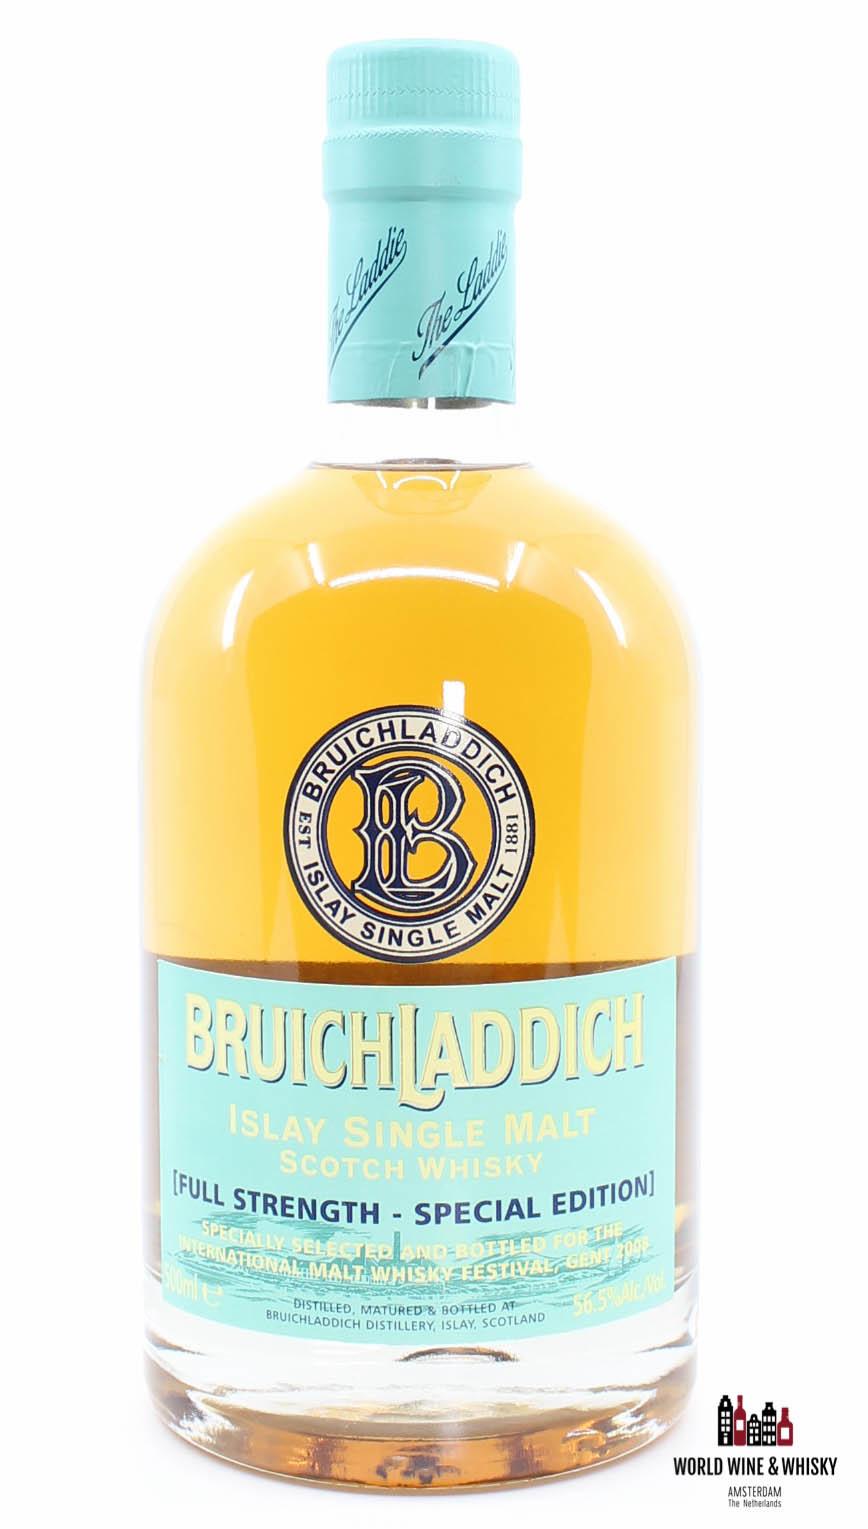 Bruichladdich Bruichladdich 2008 Full Strength - Special Edition - International Malt Whisky Festival Gent 56.5%